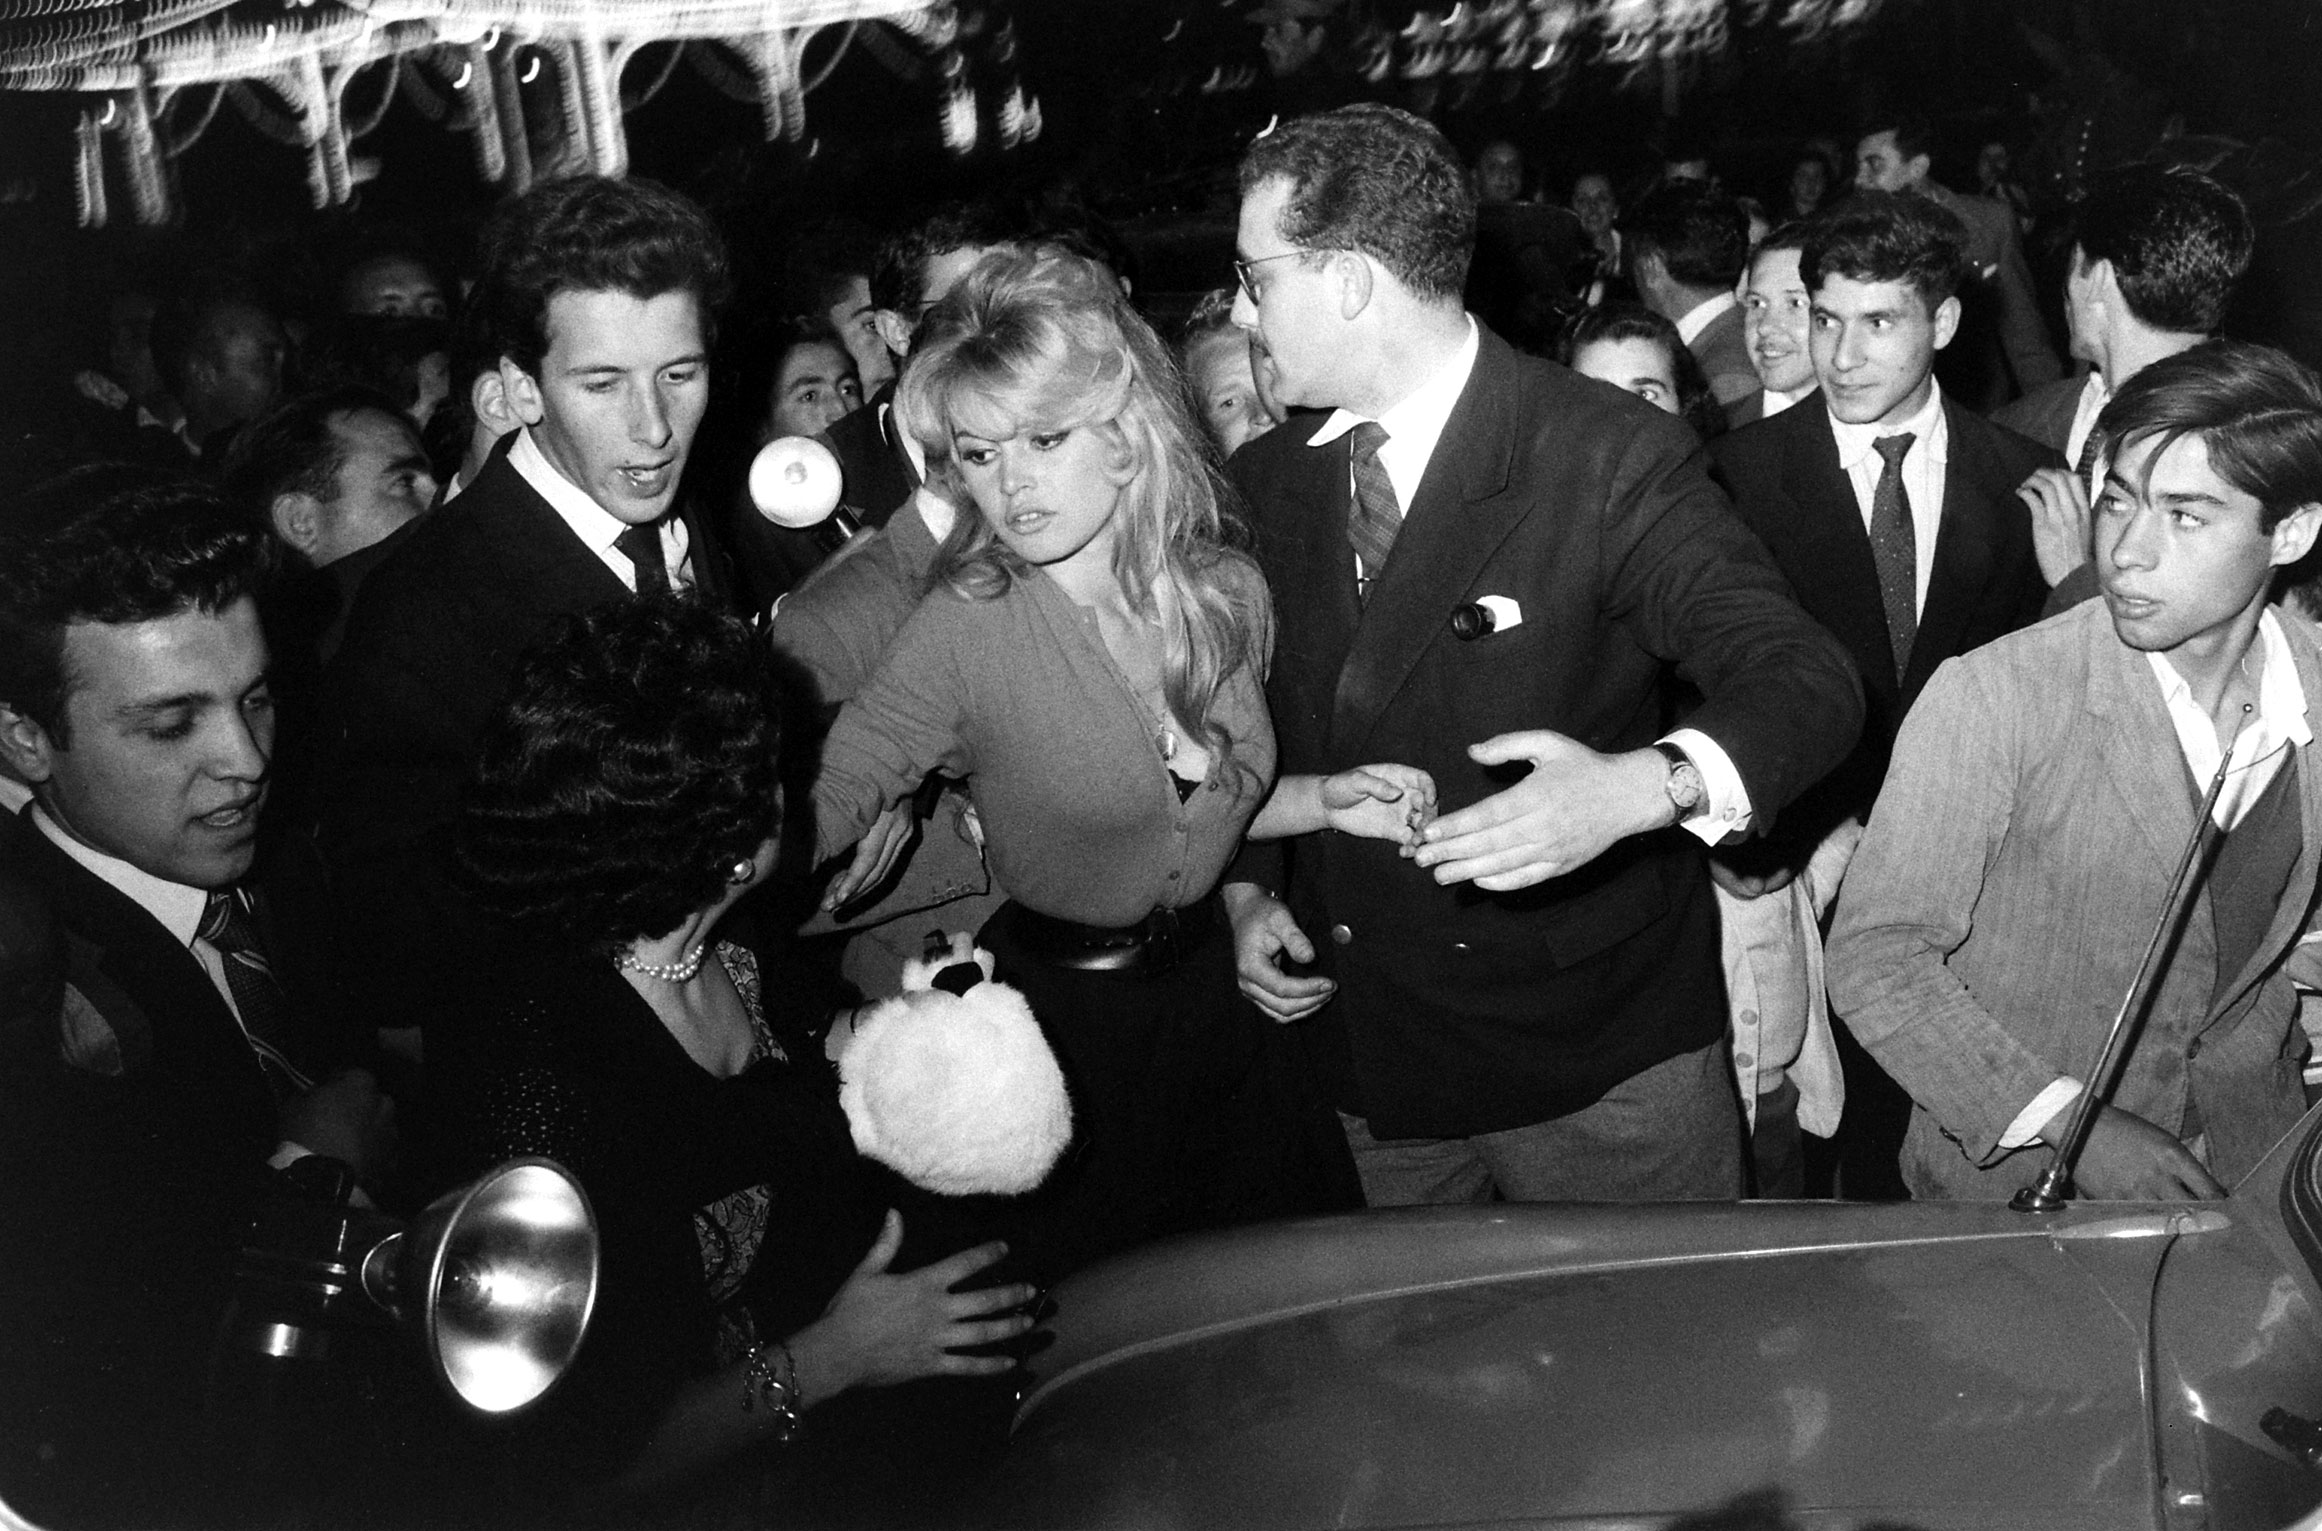 Brigitte Bardot photographed at the time she was making the film, <i>La Femme et le Pantin</i>, Spain, 1958.